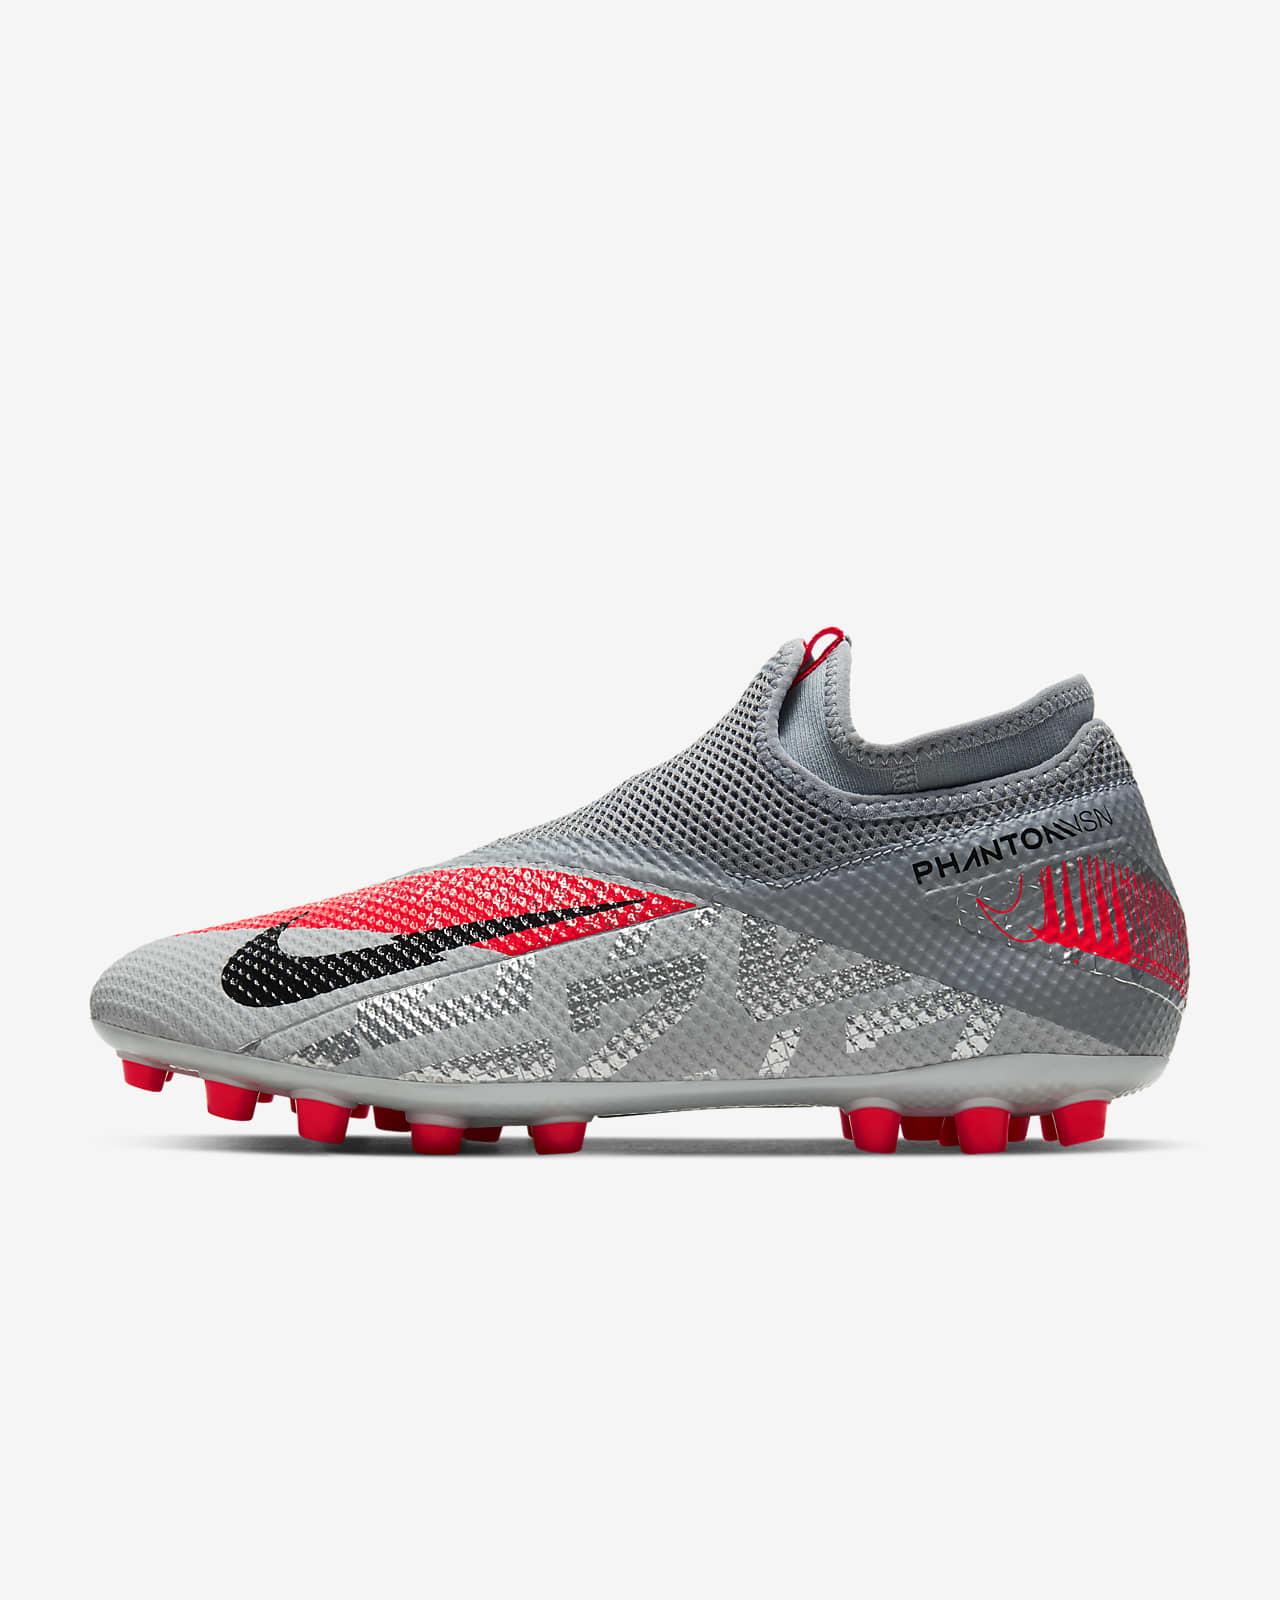 Nike Phantom Vision 2 Academy Dynamic Fit AG Fußballschuh für Kunstrasen